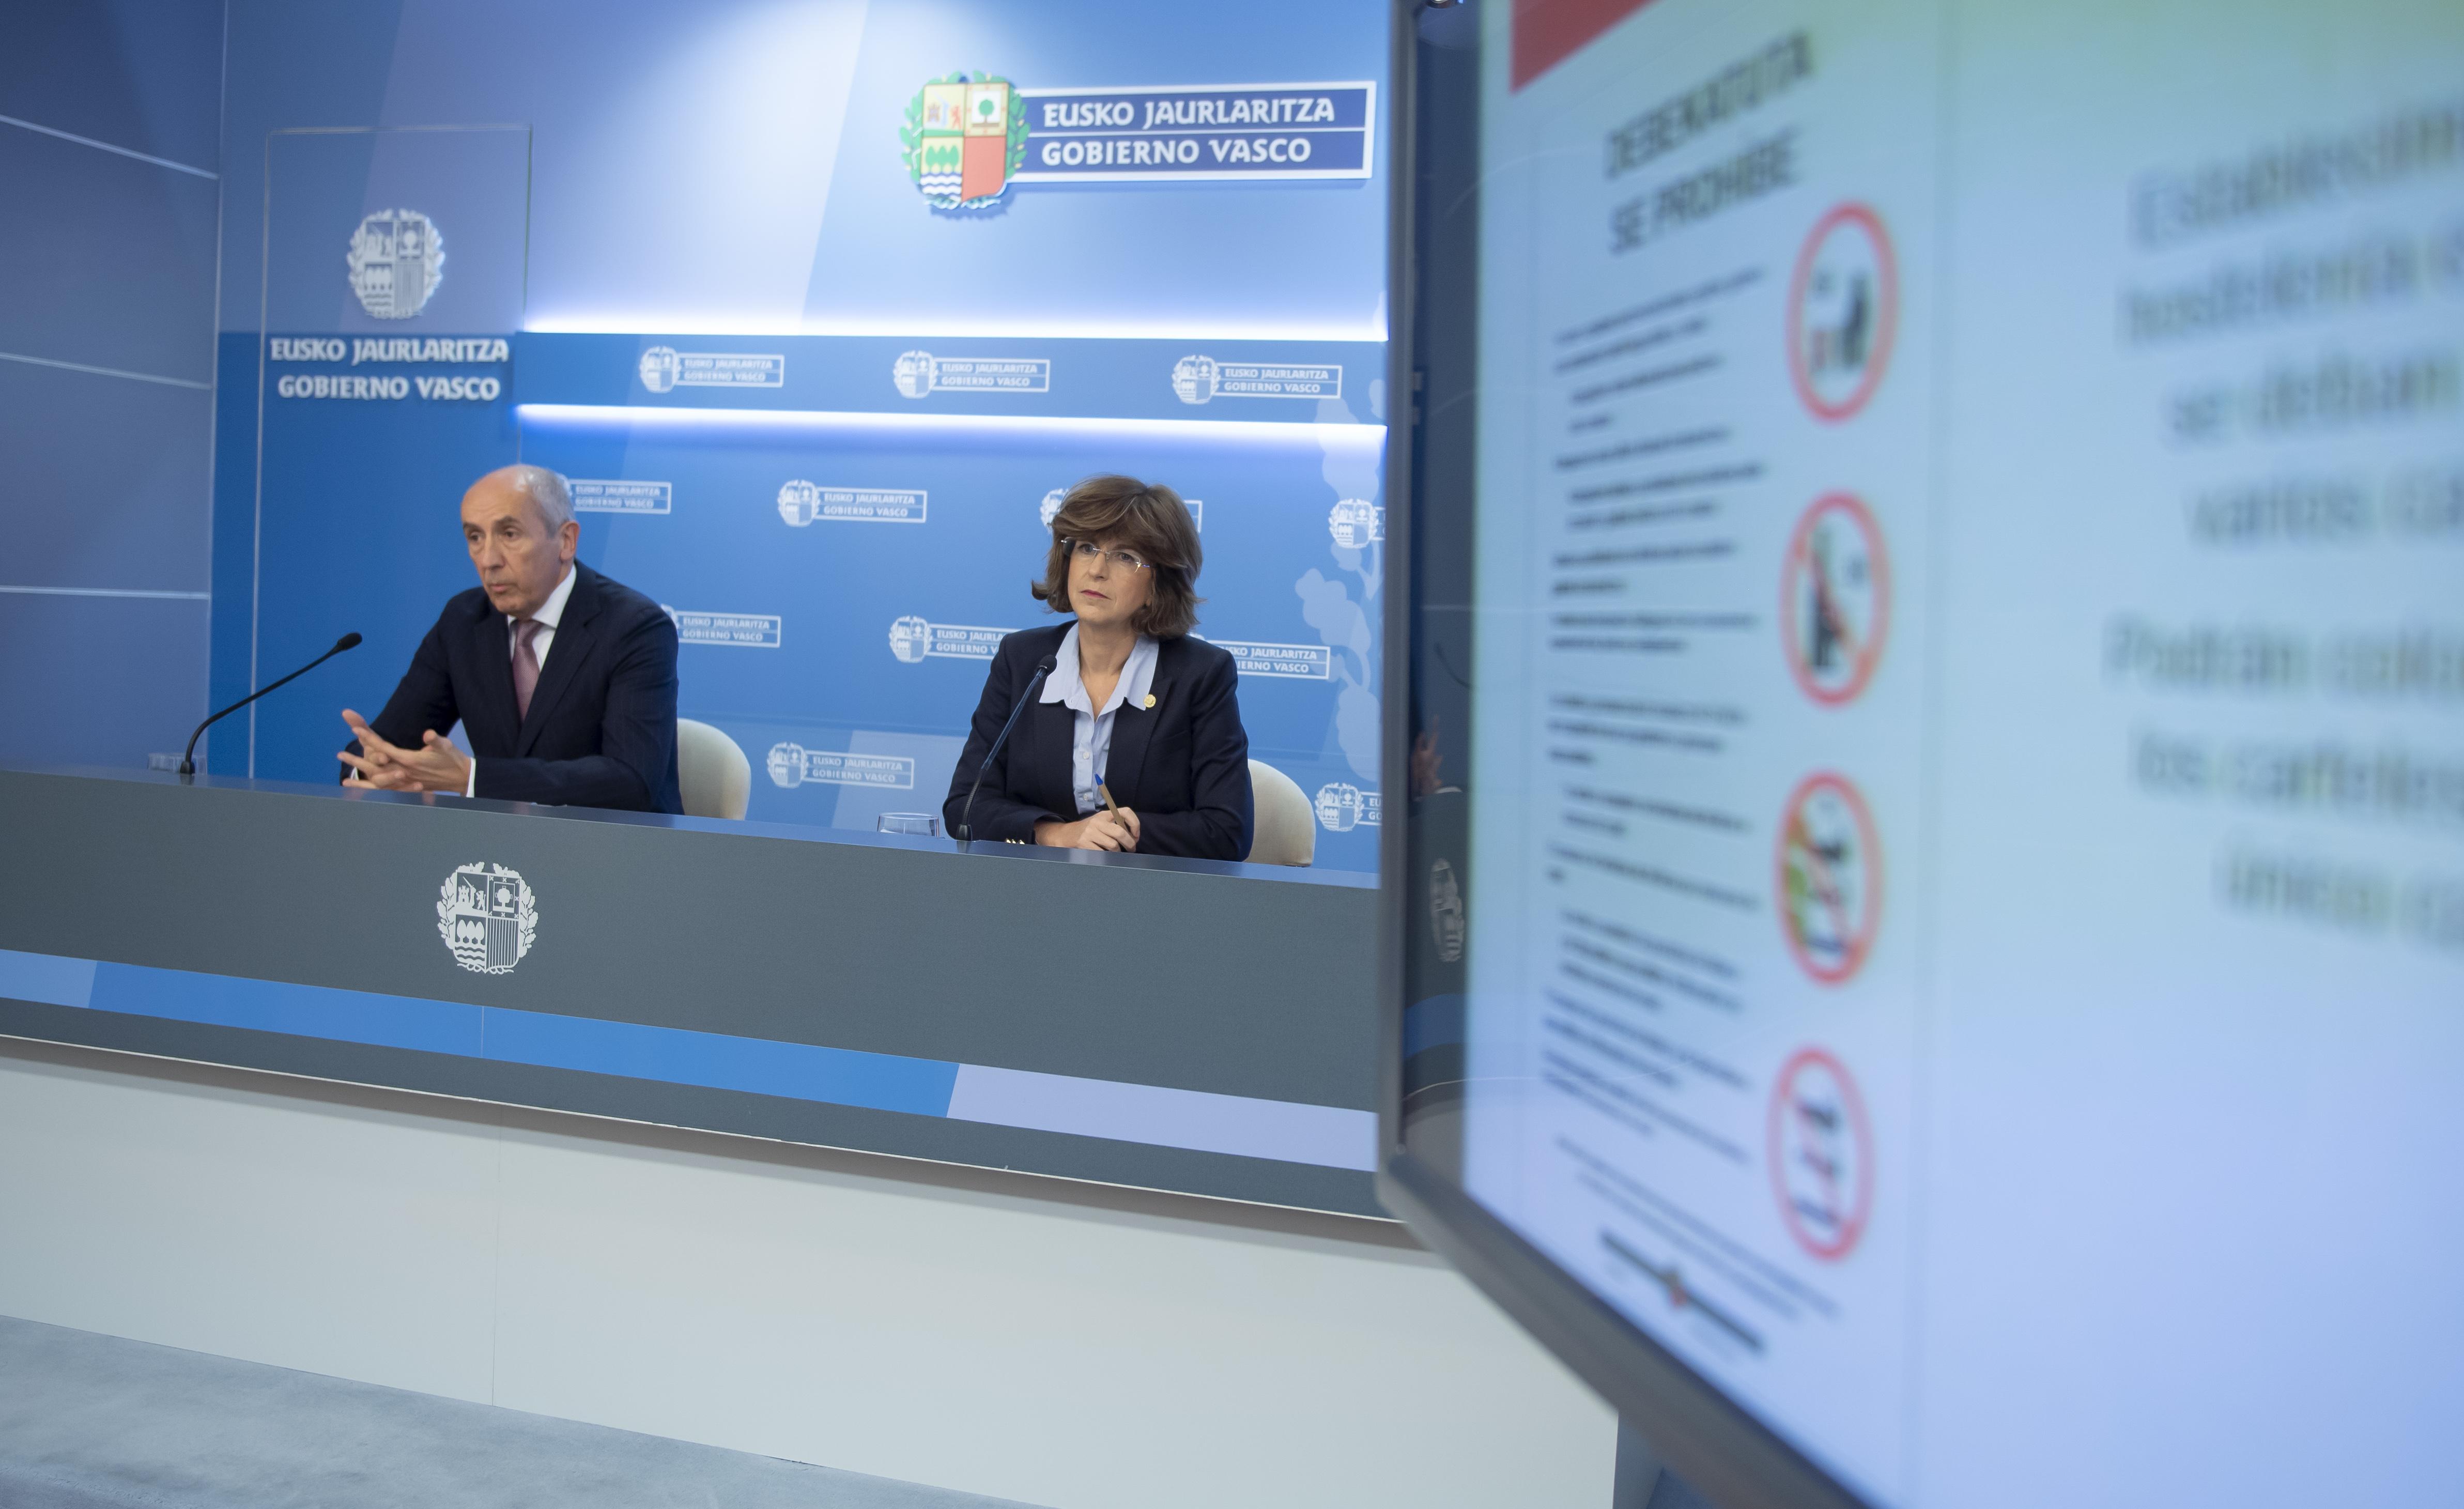 2019_11_26_consejo_gobierno.jpg